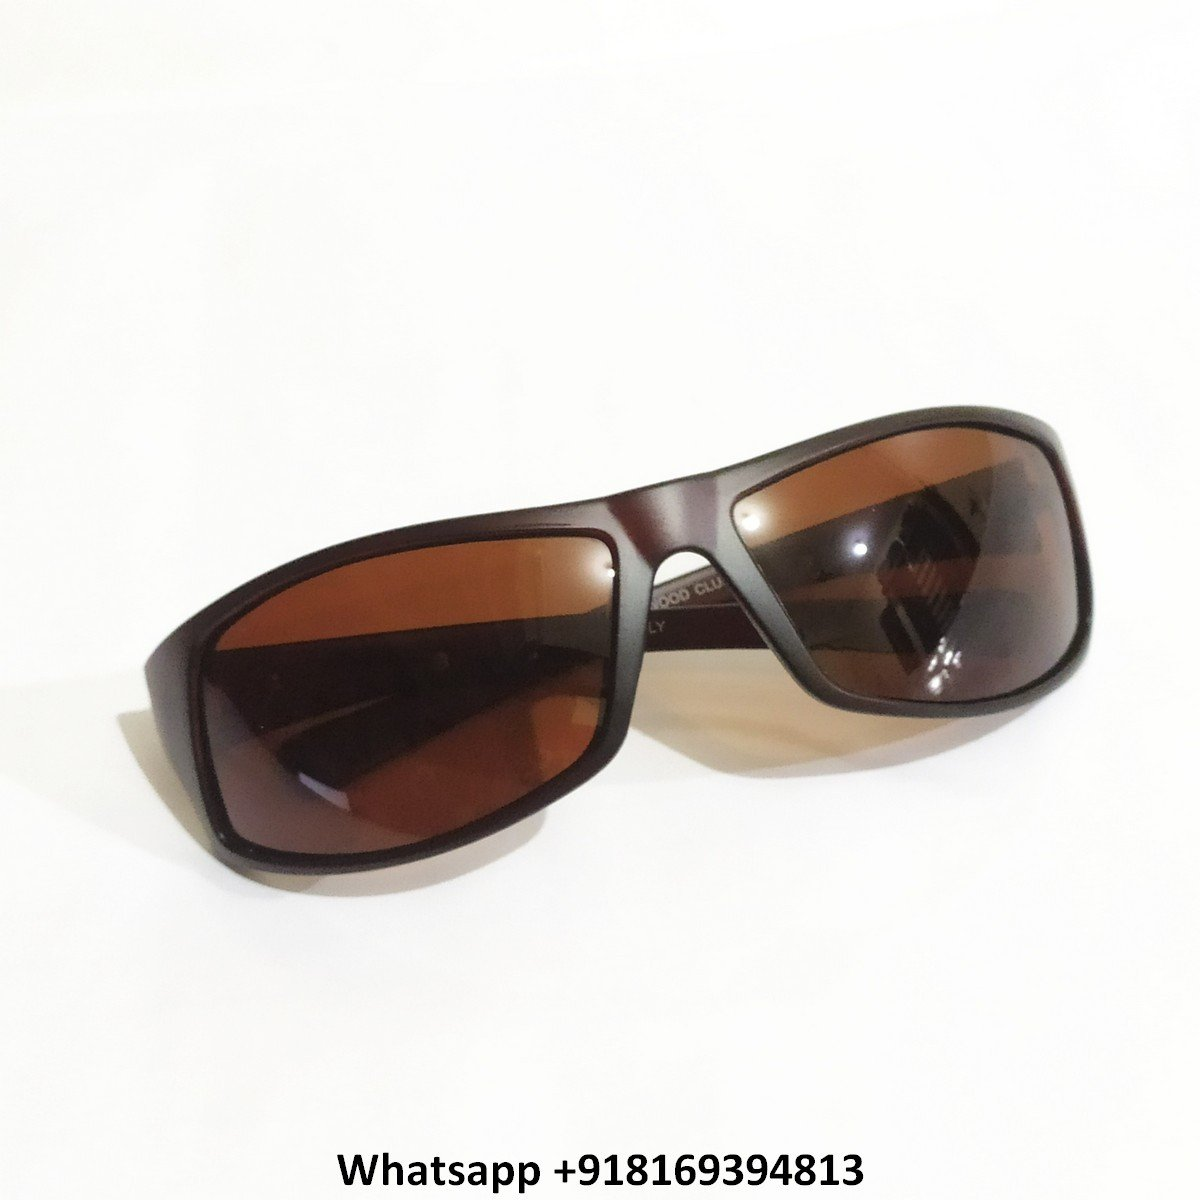 Wraparound Sports Polarized Sunglasses for Men and Women 10062BR